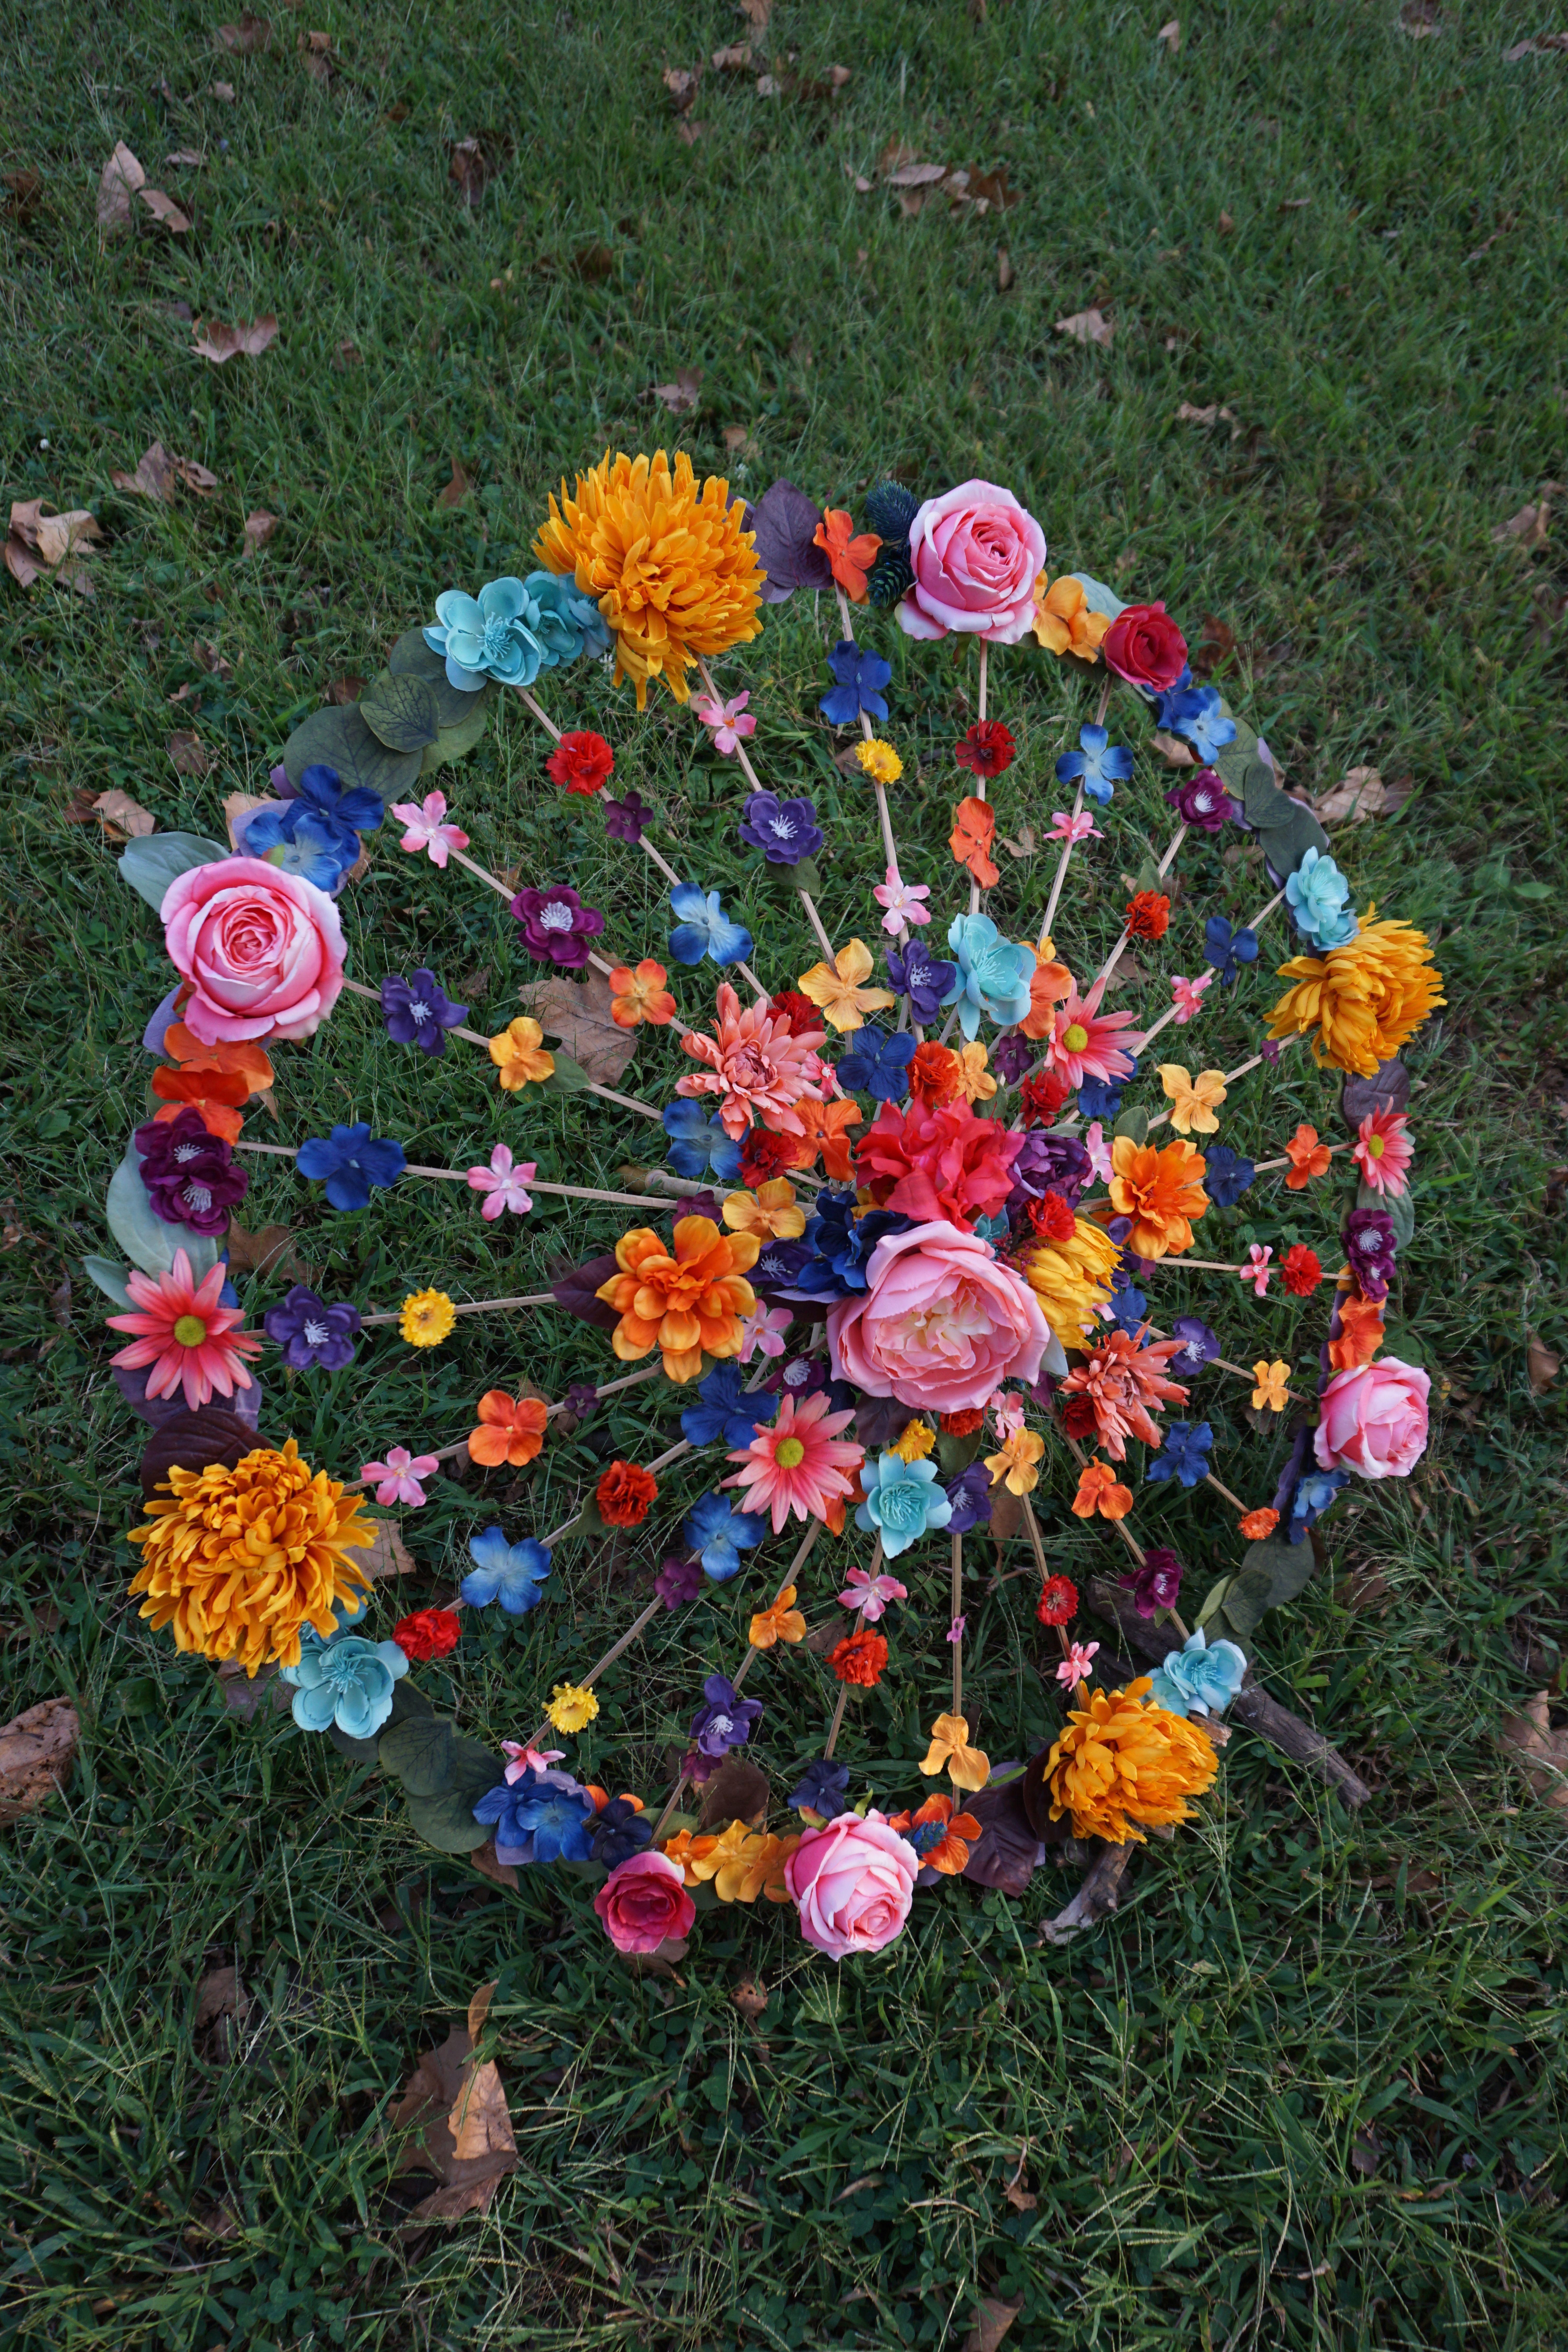 Bridesmaids Festival Gear Jewel Tone Autumn Photo Prop Floral Wedding Umbrella Fall Flower Parasol Fall Wedding Bridal Accessory